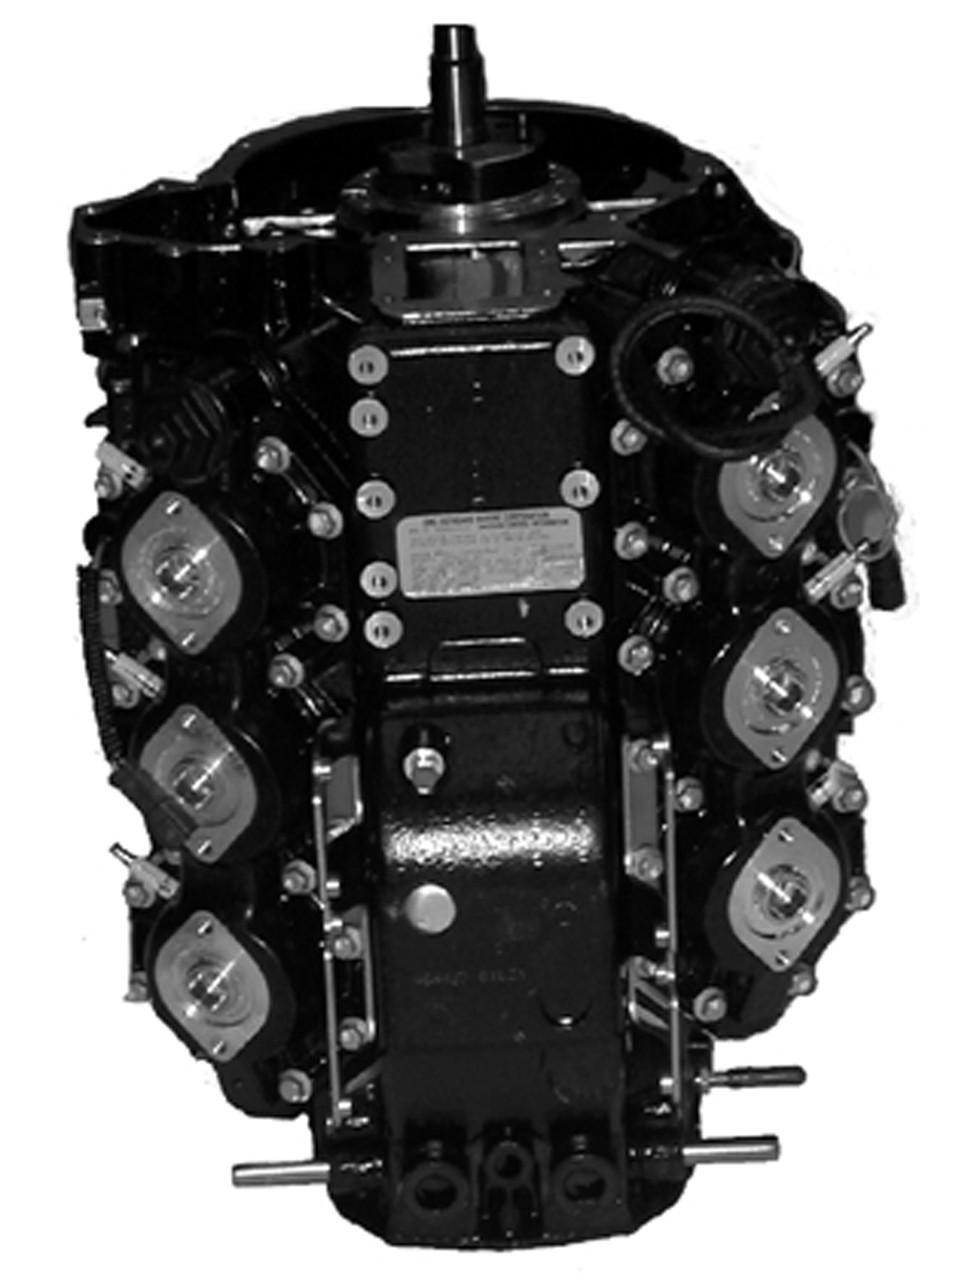 Remanufactured Johnson/Evinrude 135/150/175 HP 60° Ficht V6